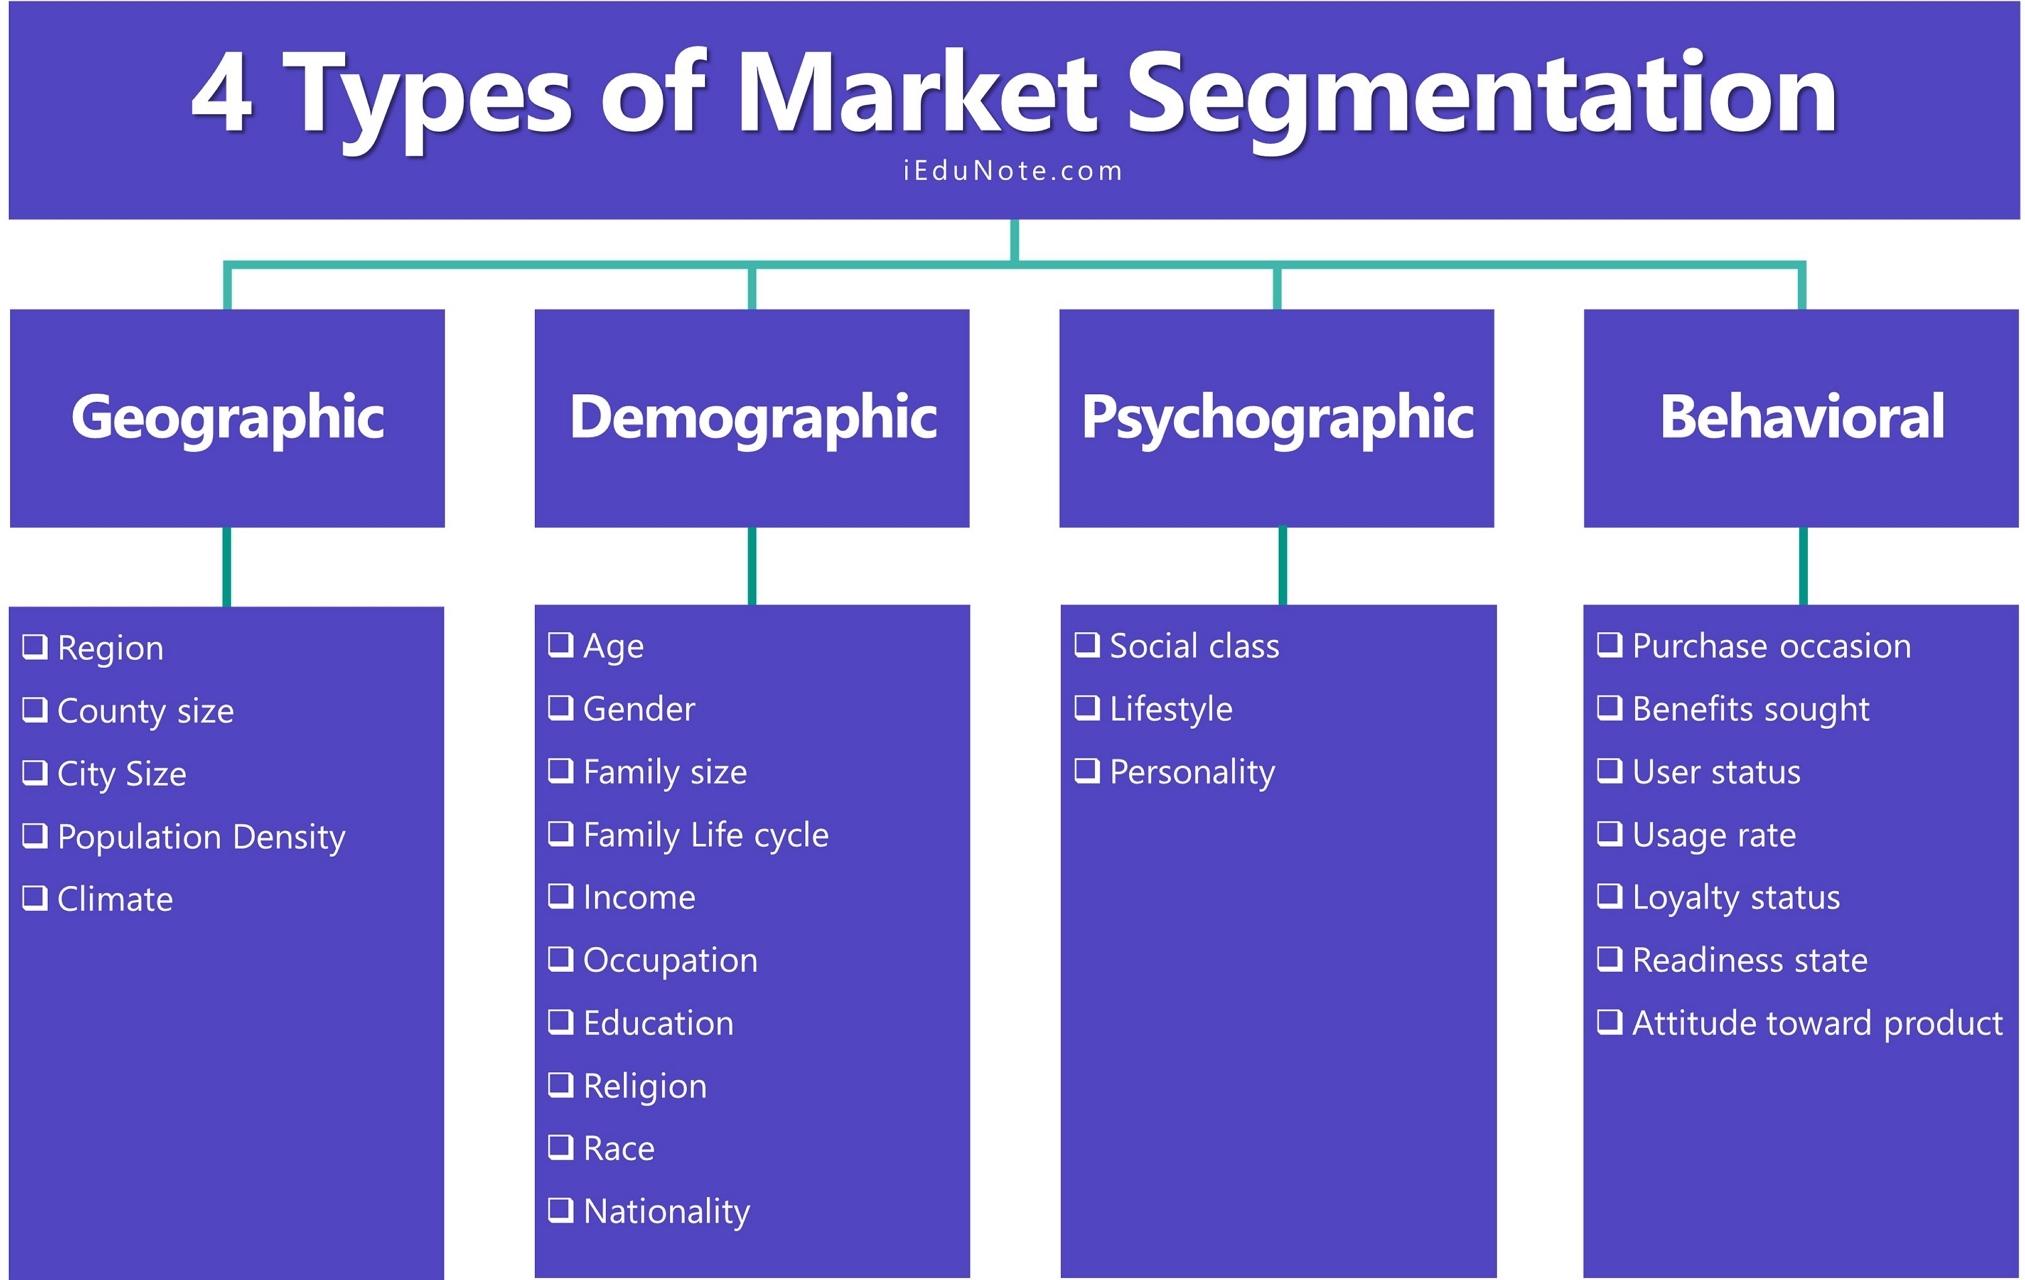 Types of market segmentation